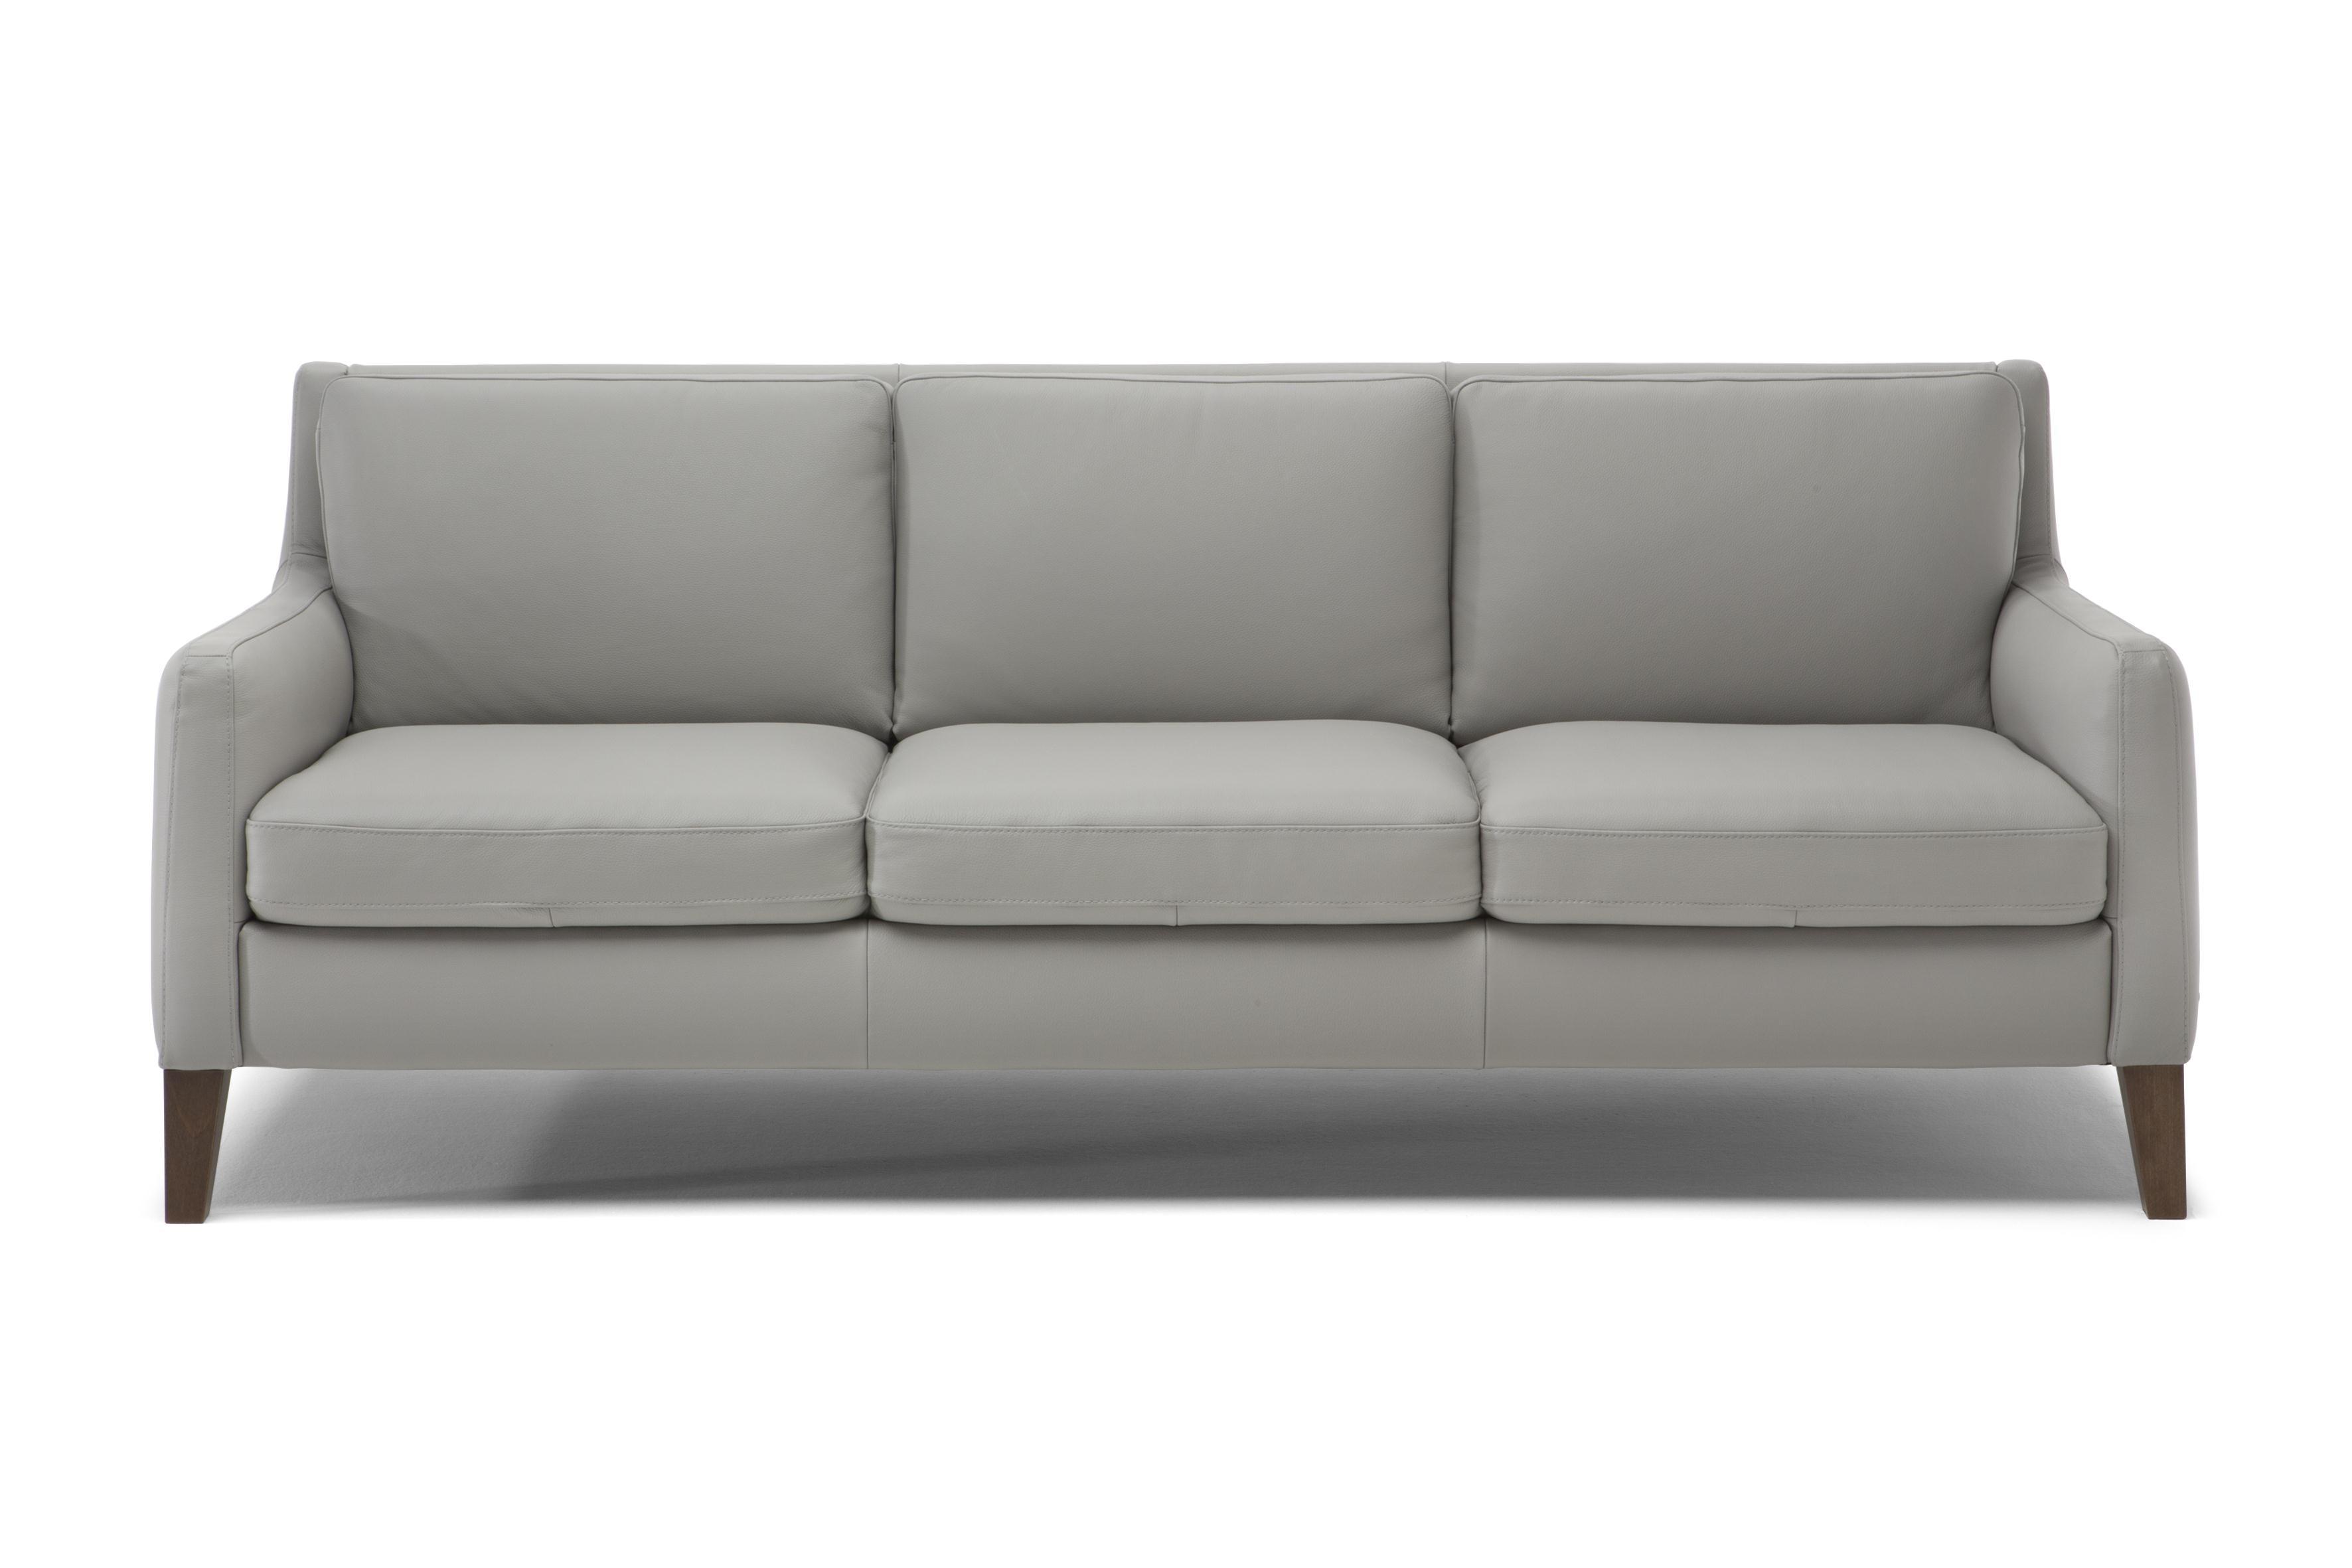 Attrayant Natuzzi Editions Leather Sofa C009 064